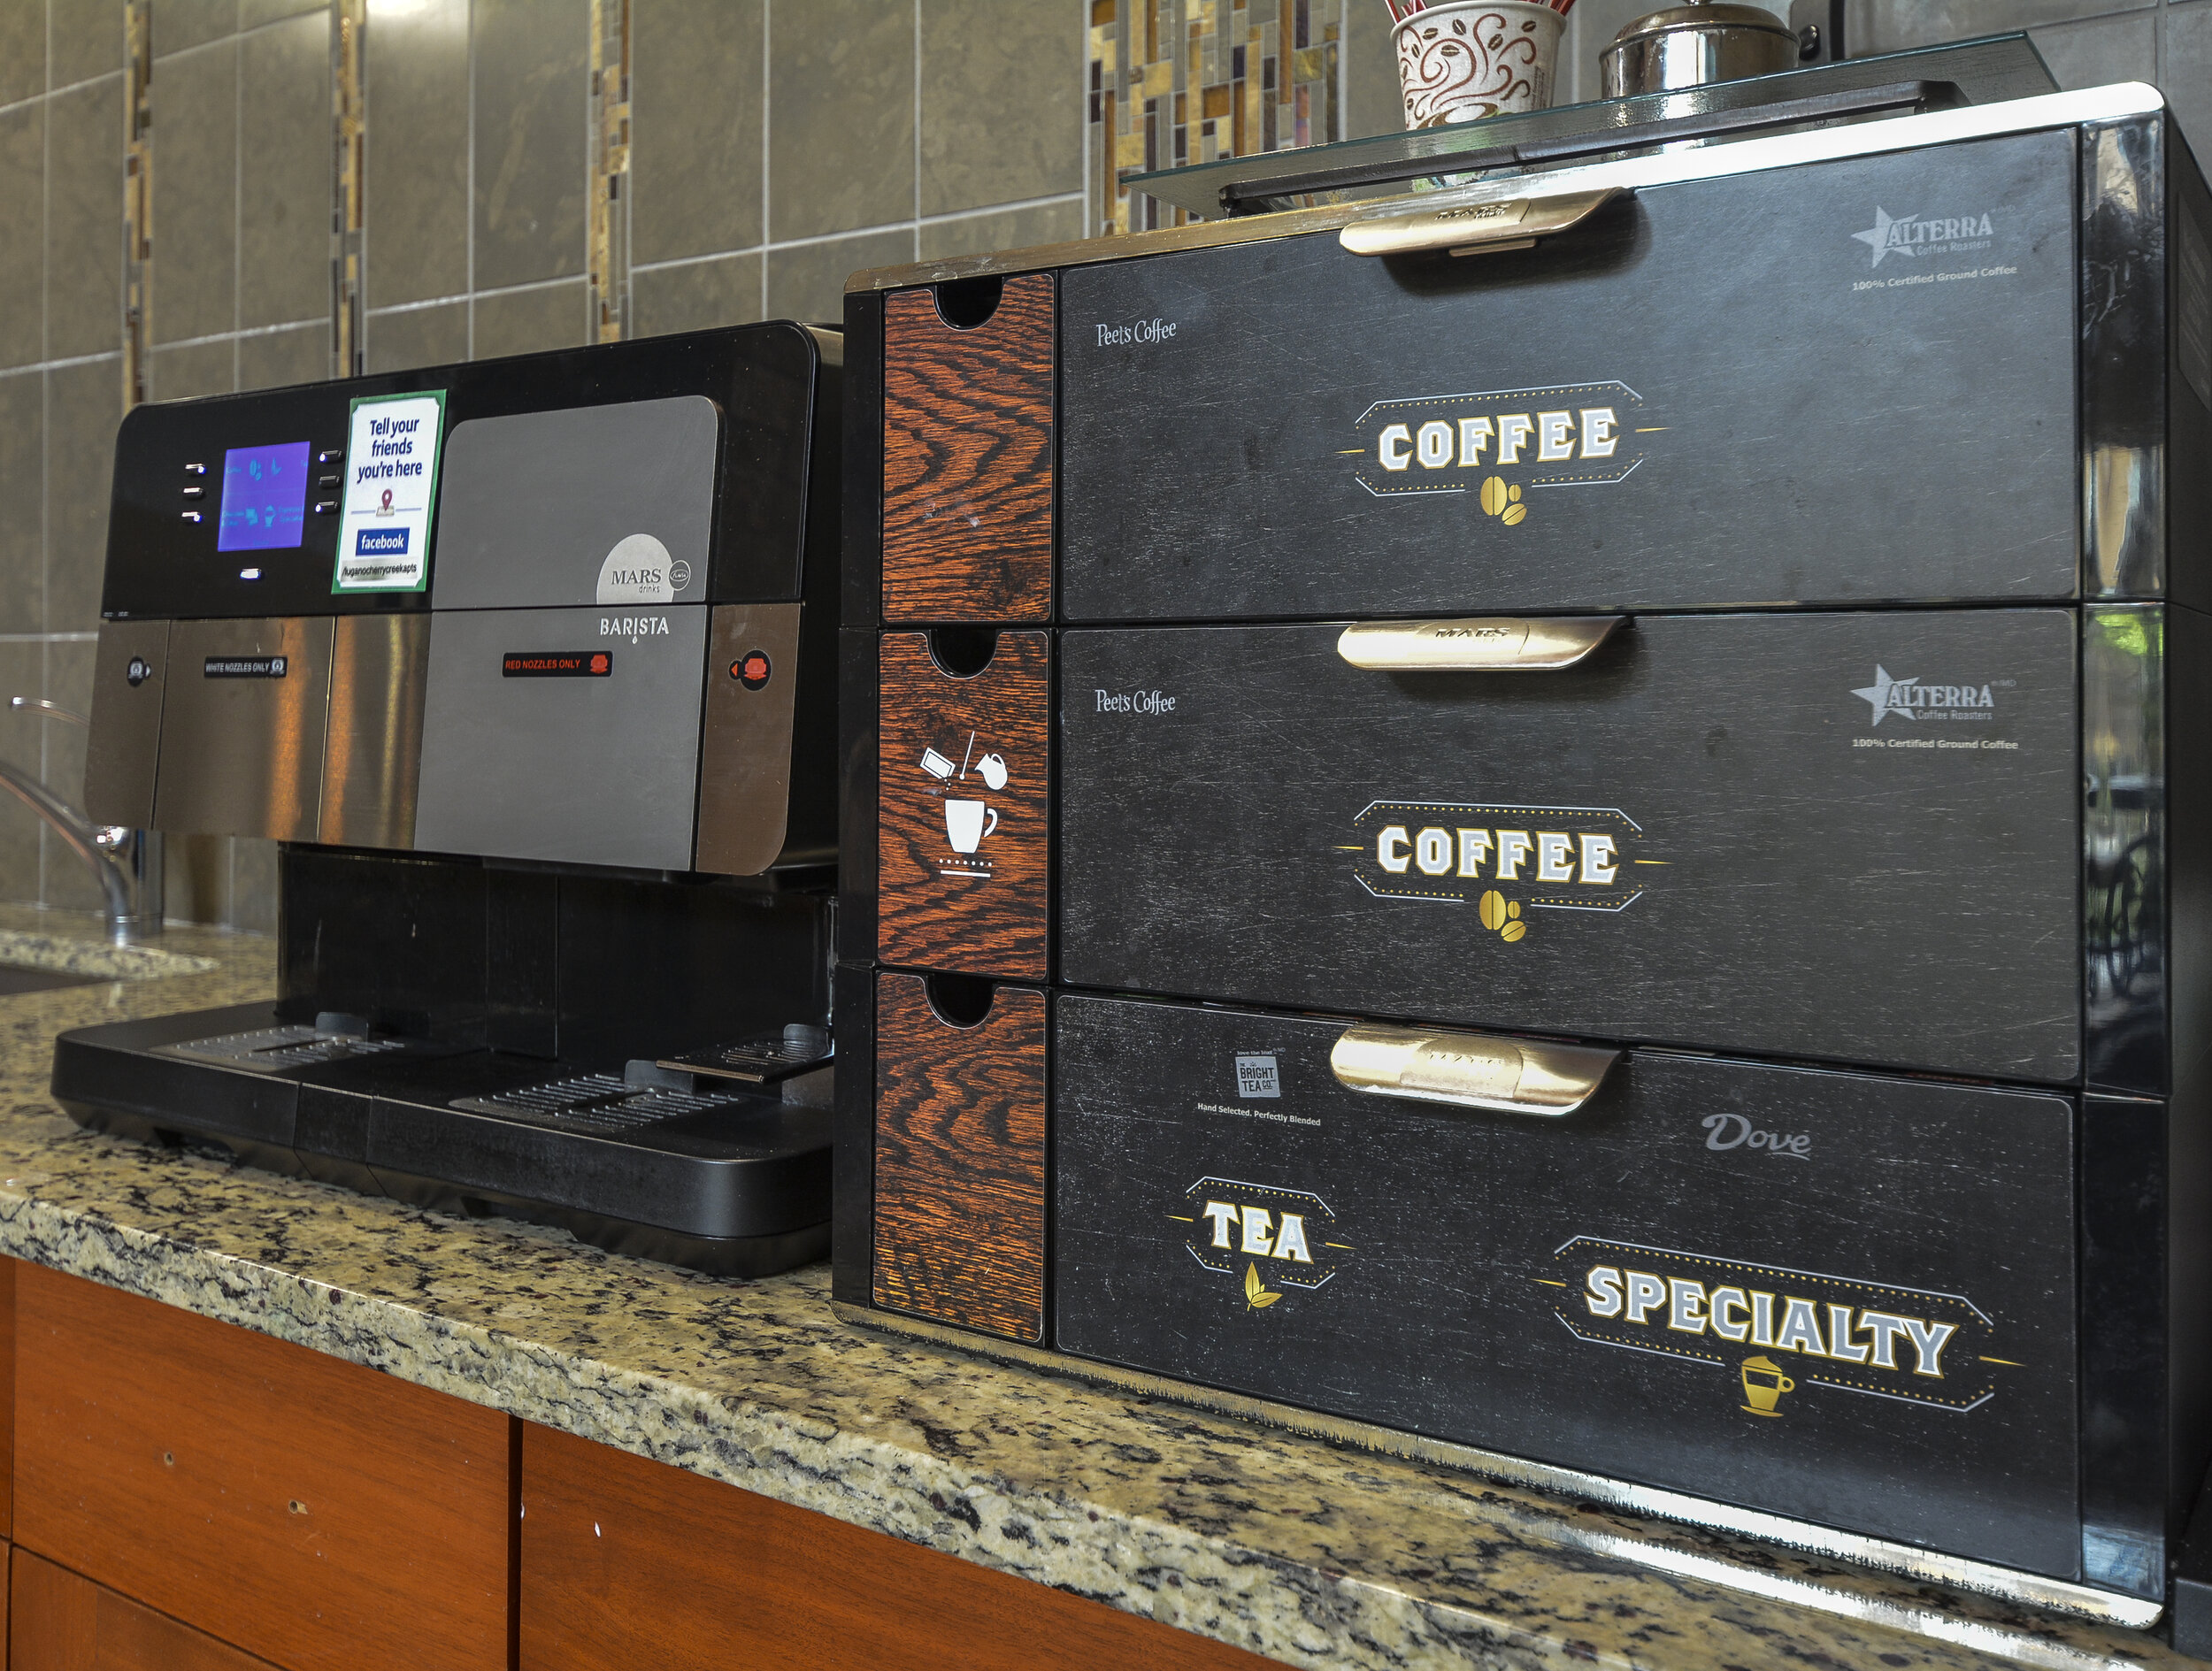 18-Grab a Coffee on The Go.jpg